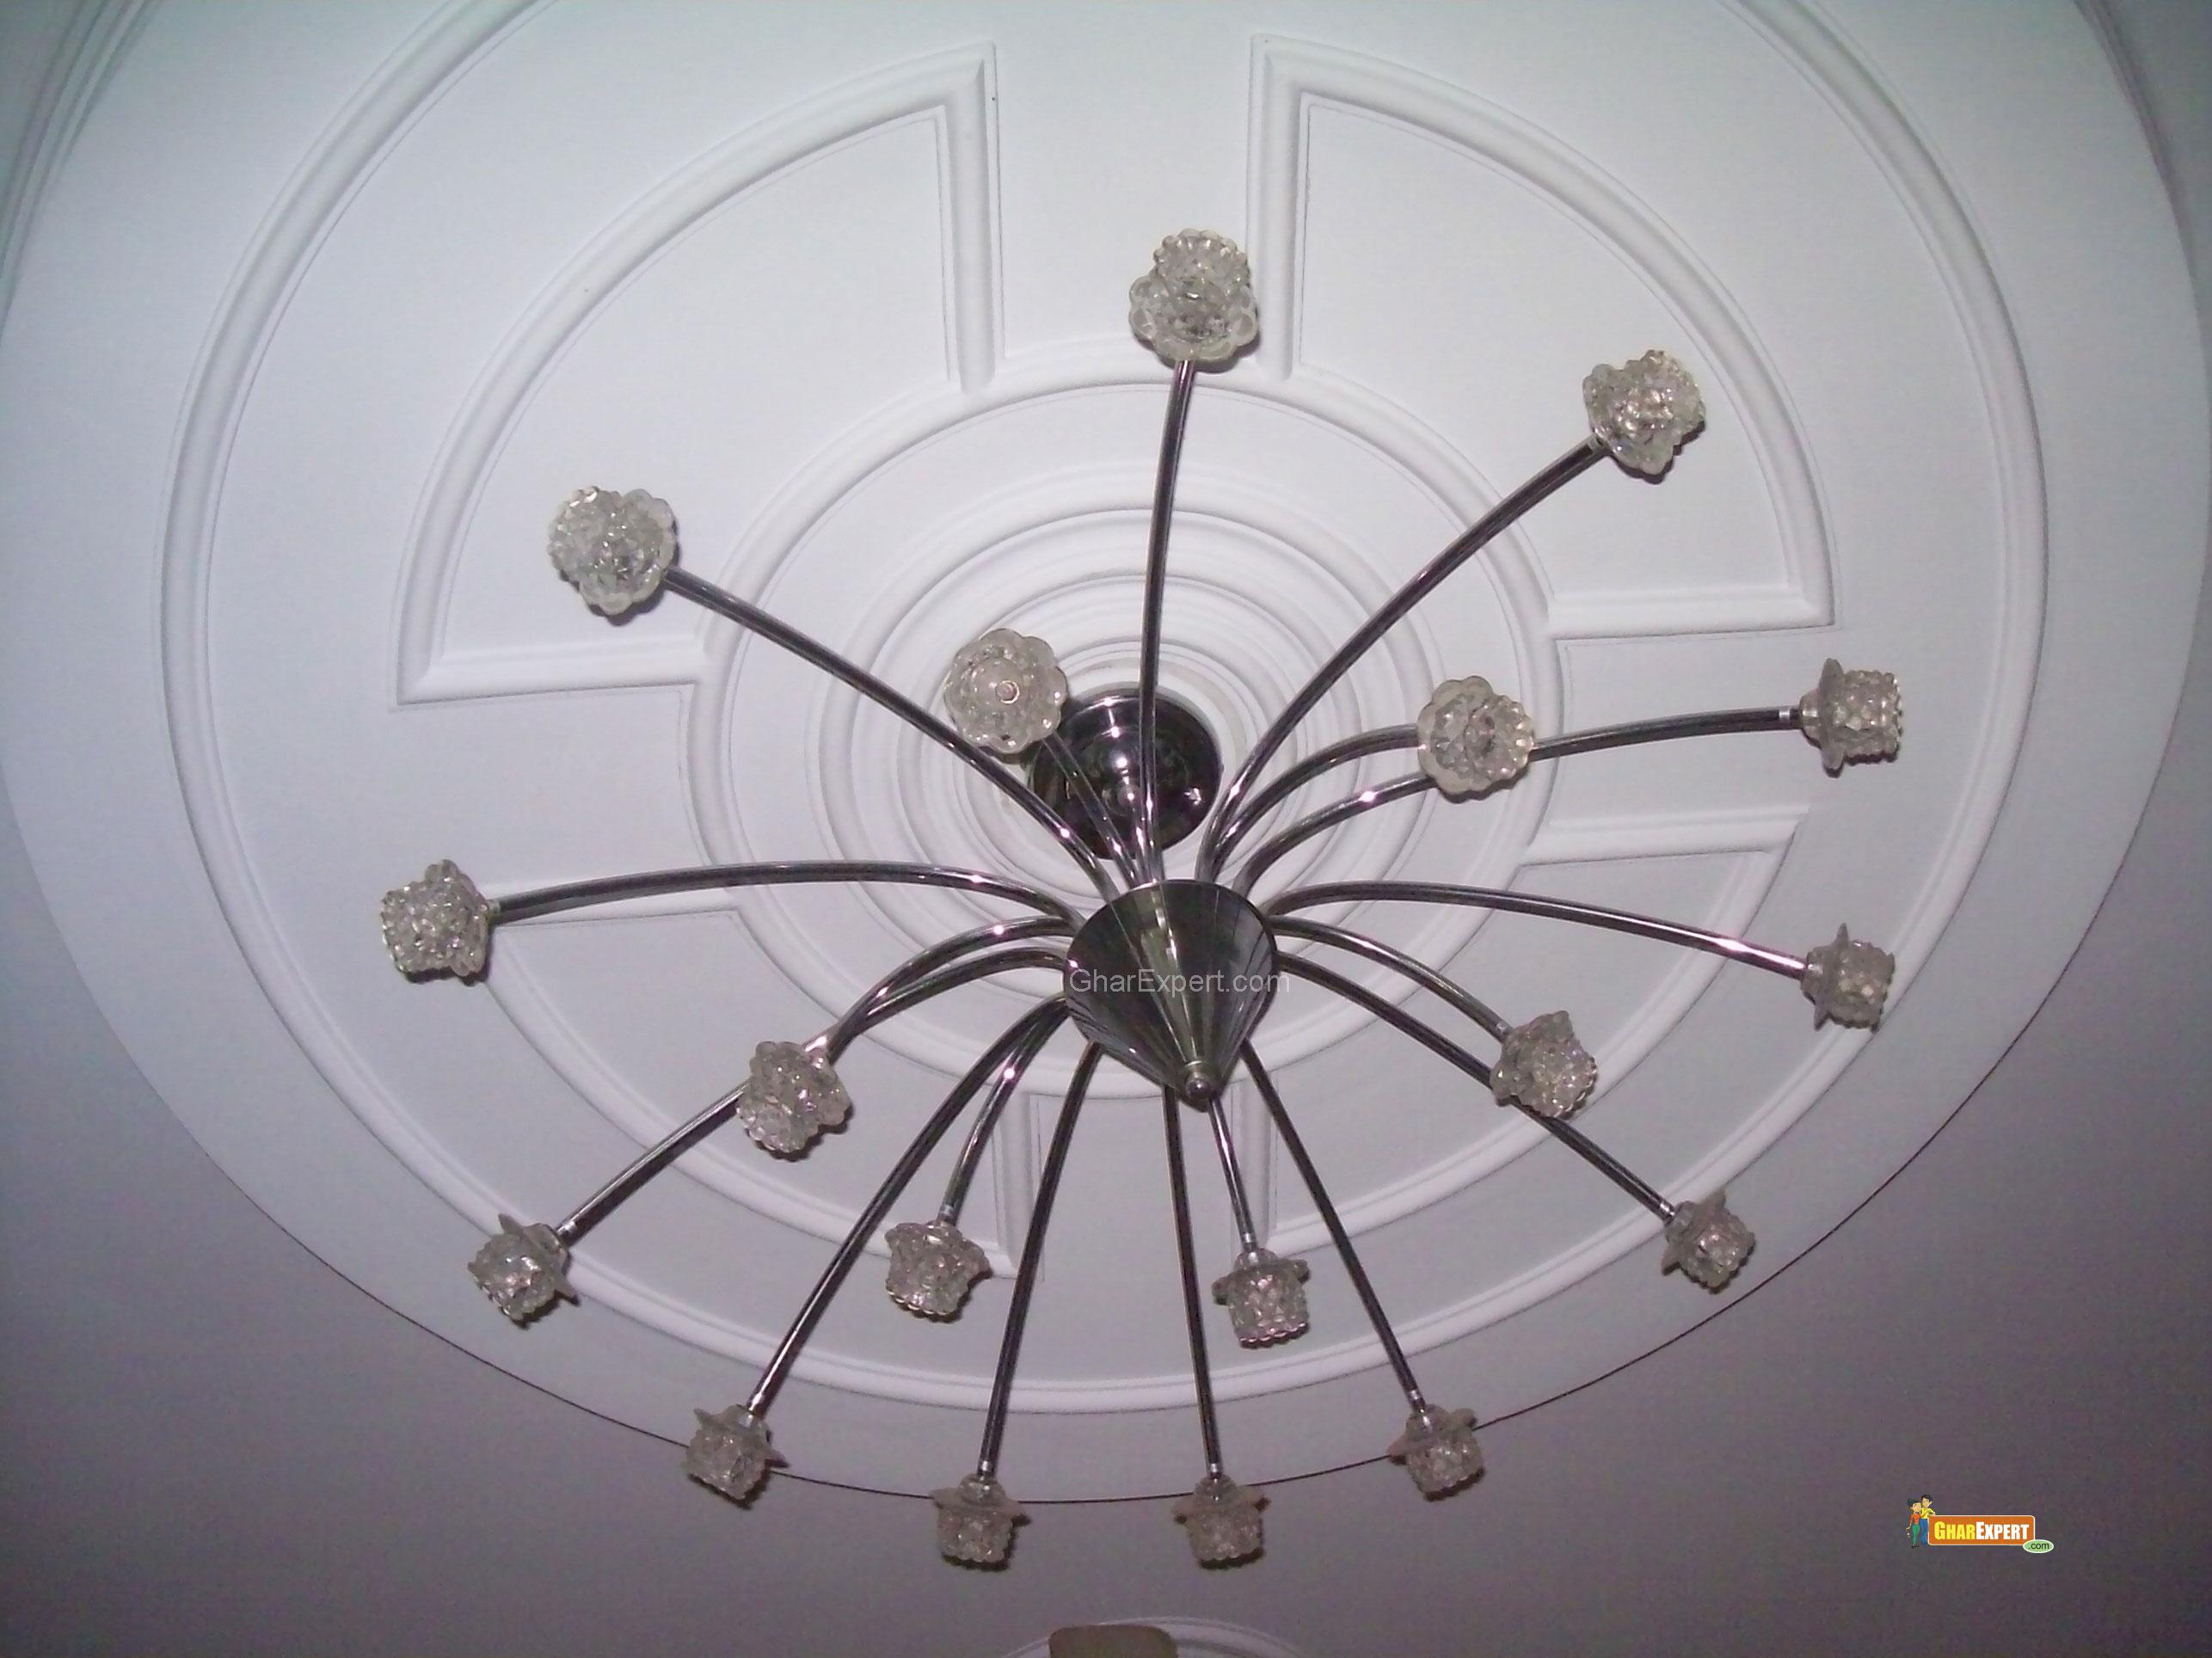 Auspicious circular ceiling.